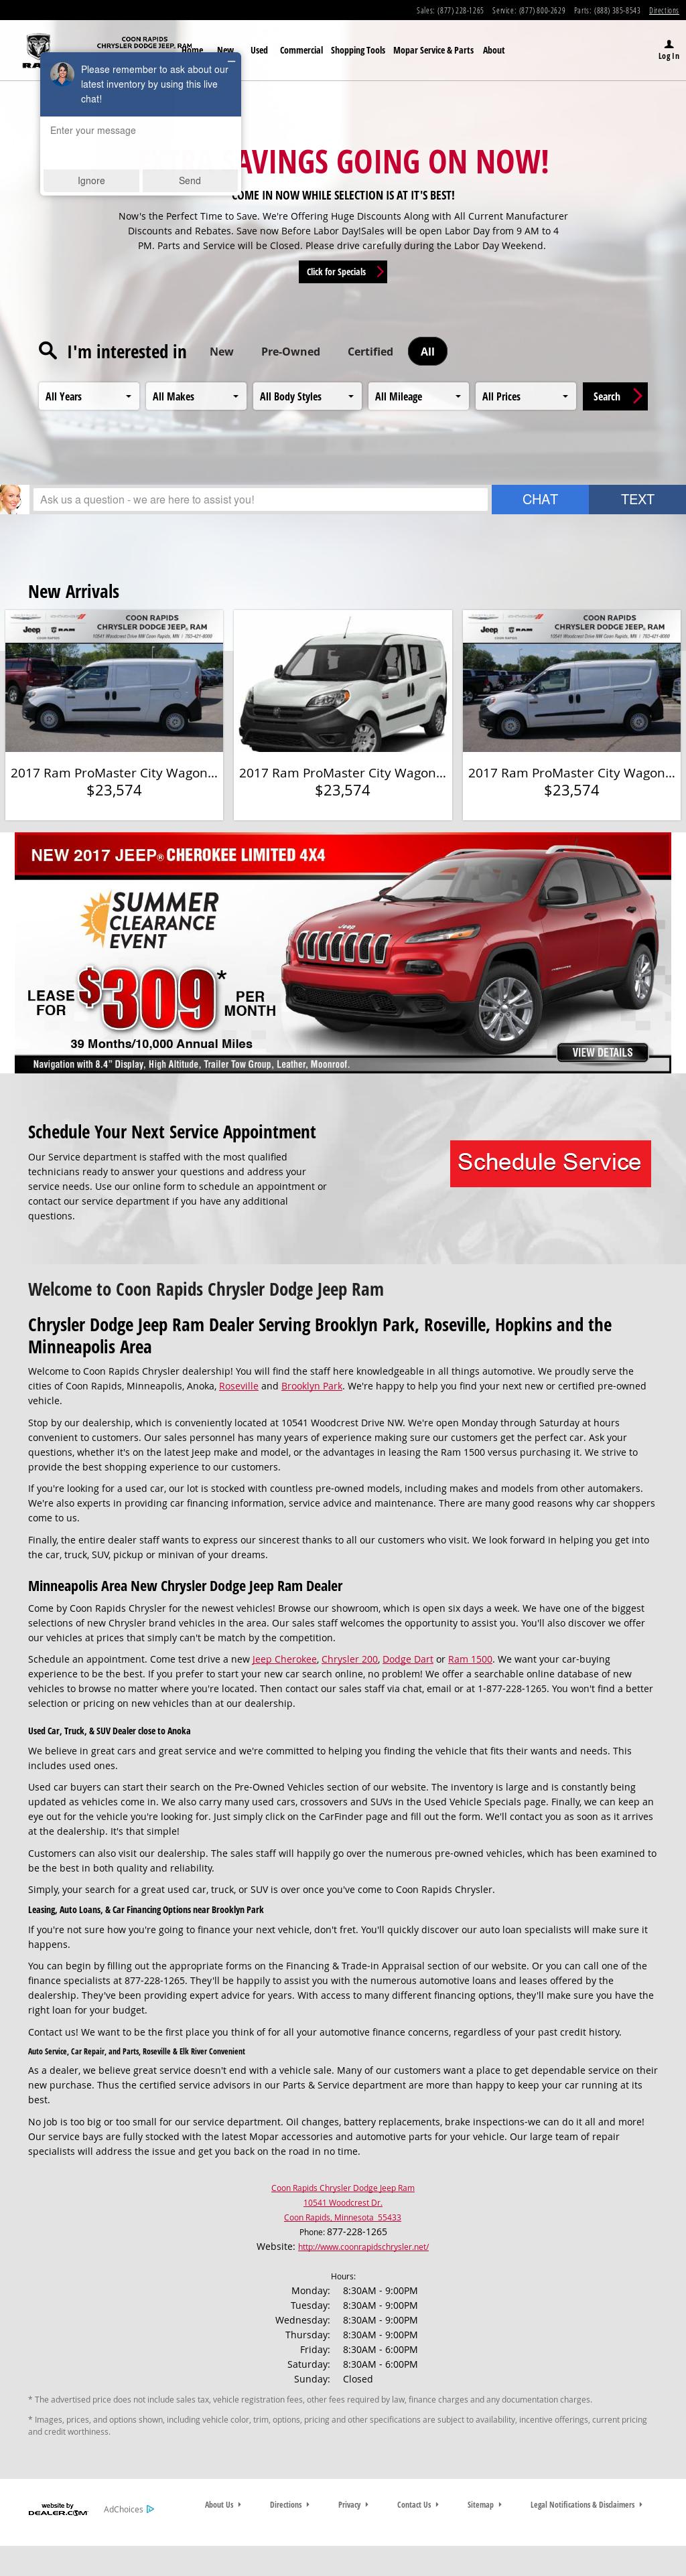 Coon Rapids Chrysler Dodge Jeep Ram petitors Revenue and